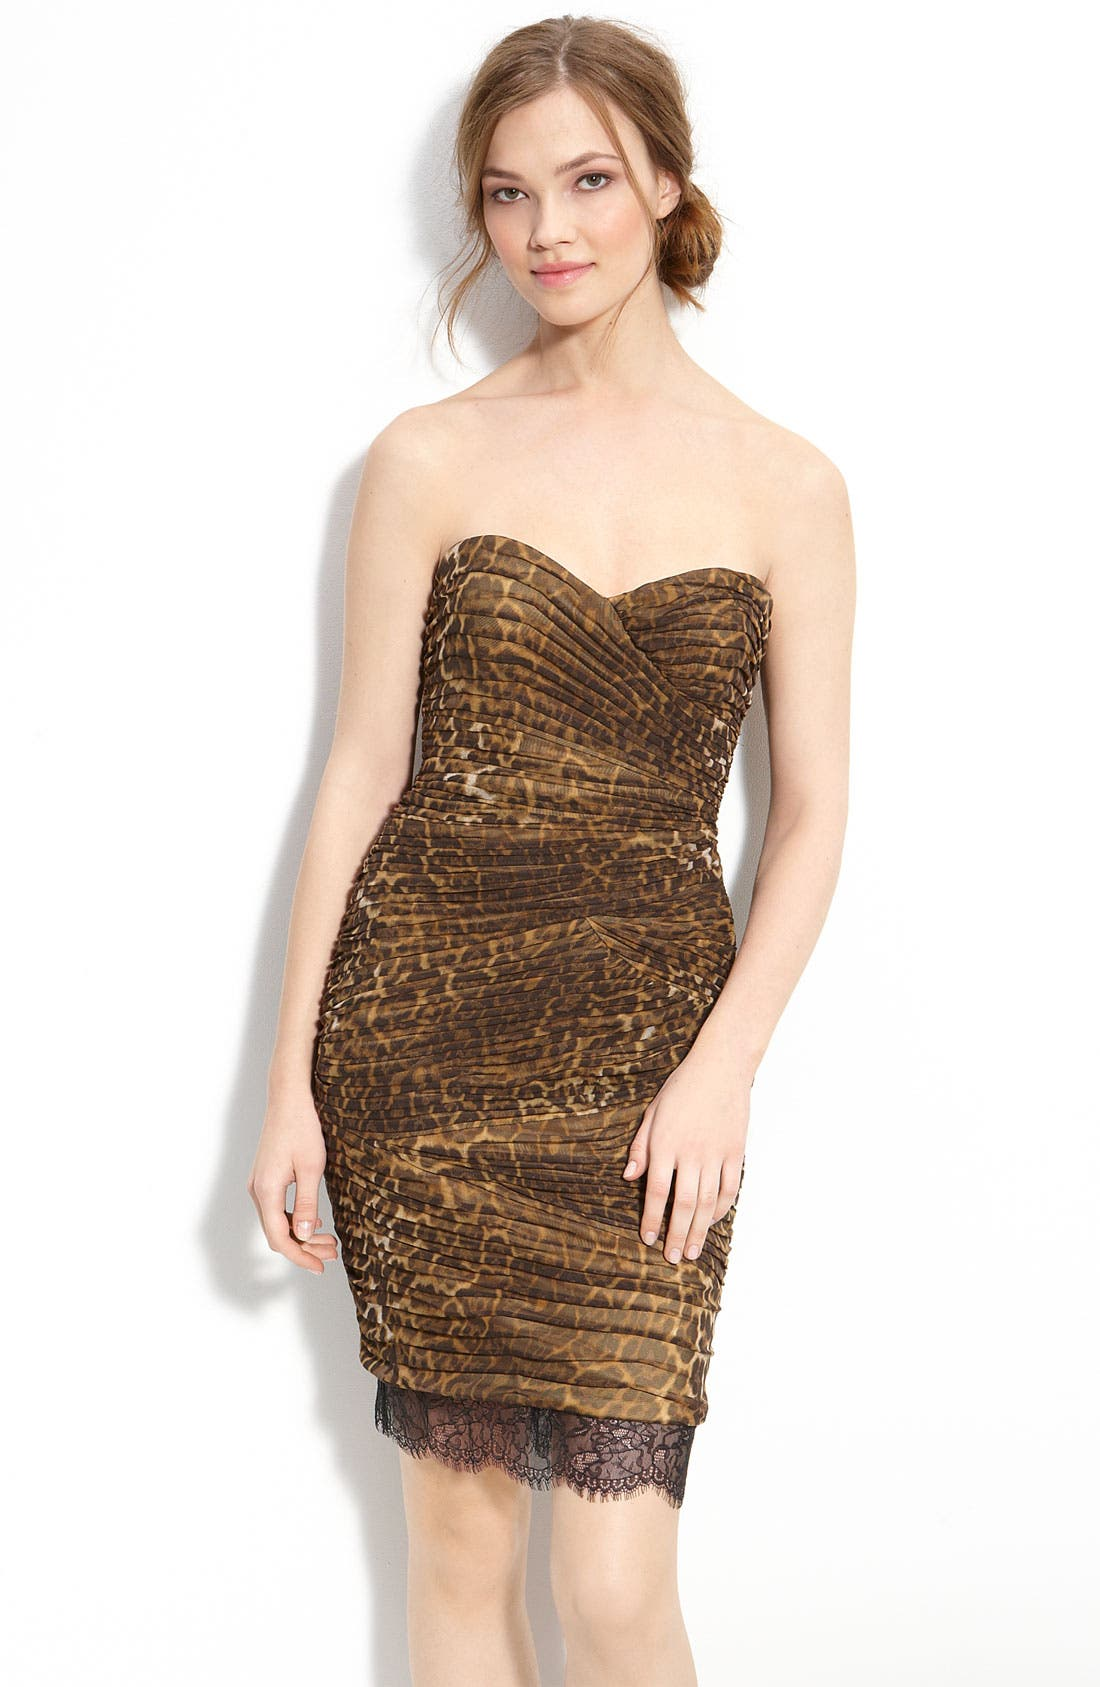 Alternate Image 1 Selected - BCBGMAXAZRIA Strapless Leopard Print Mesh Dress